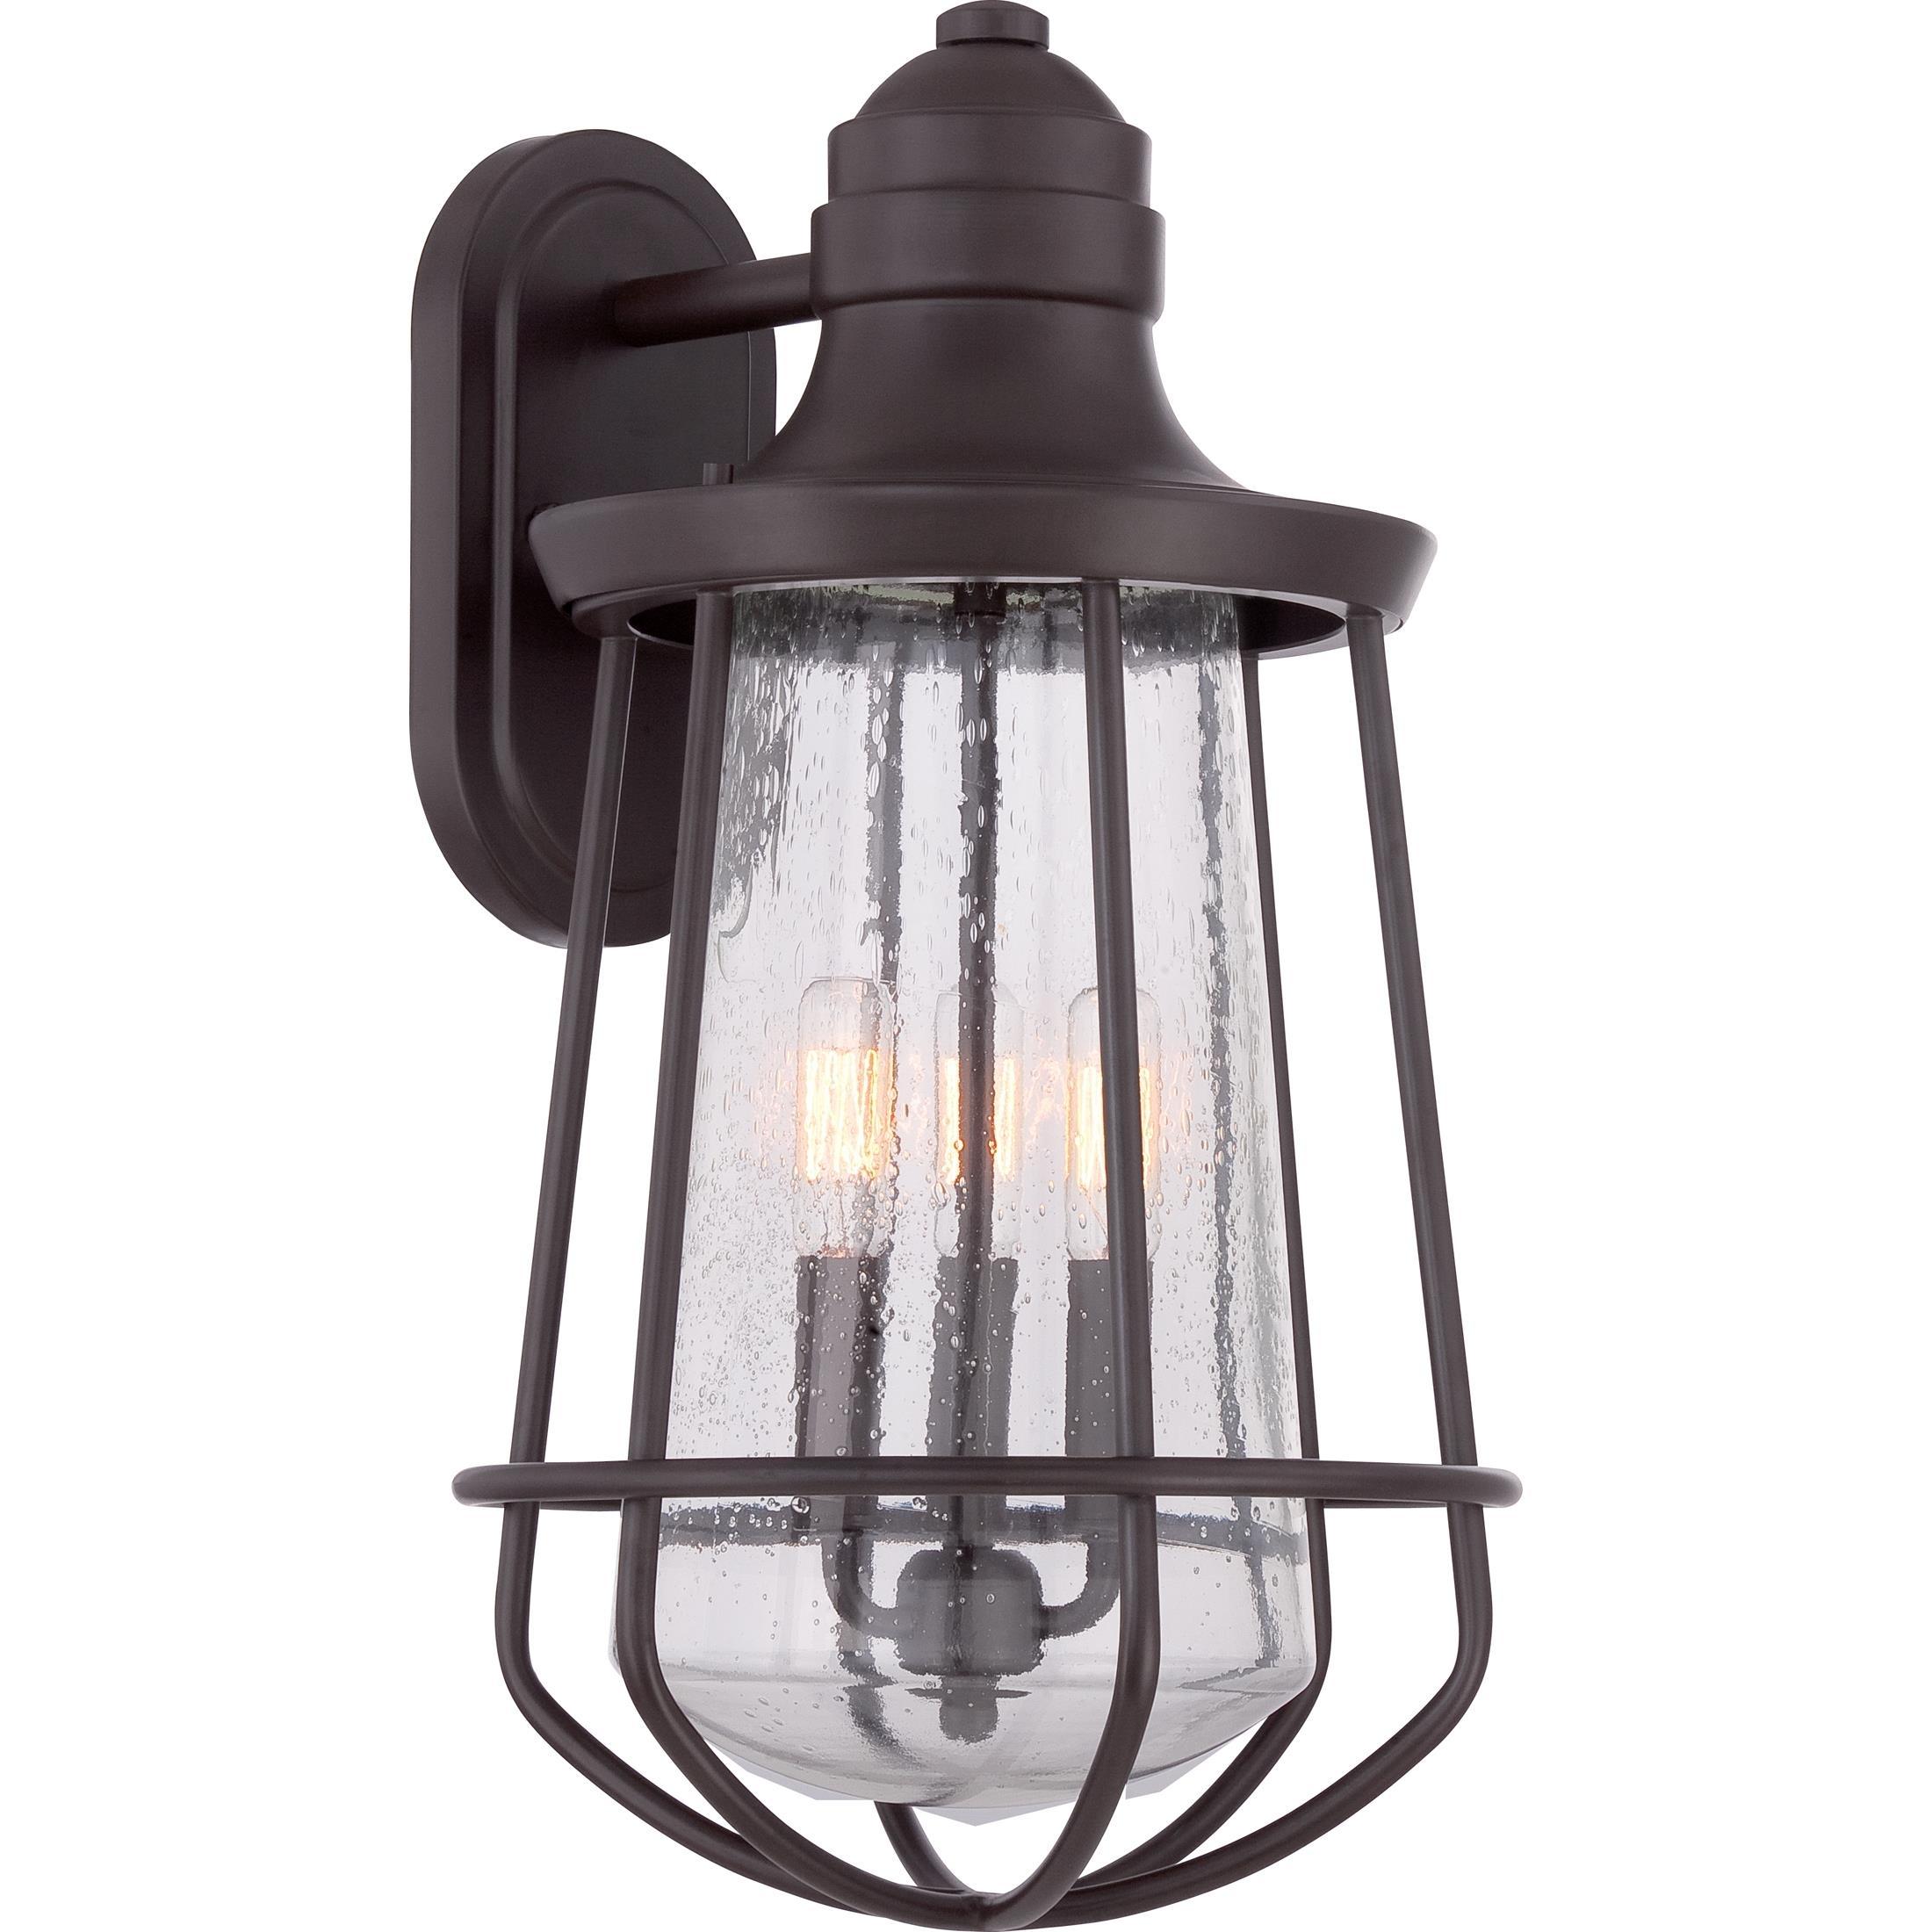 Quoizel Lighting Mre8410Wt Shipped Direct inside Quoizel Outdoor Lanterns (Image 4 of 20)